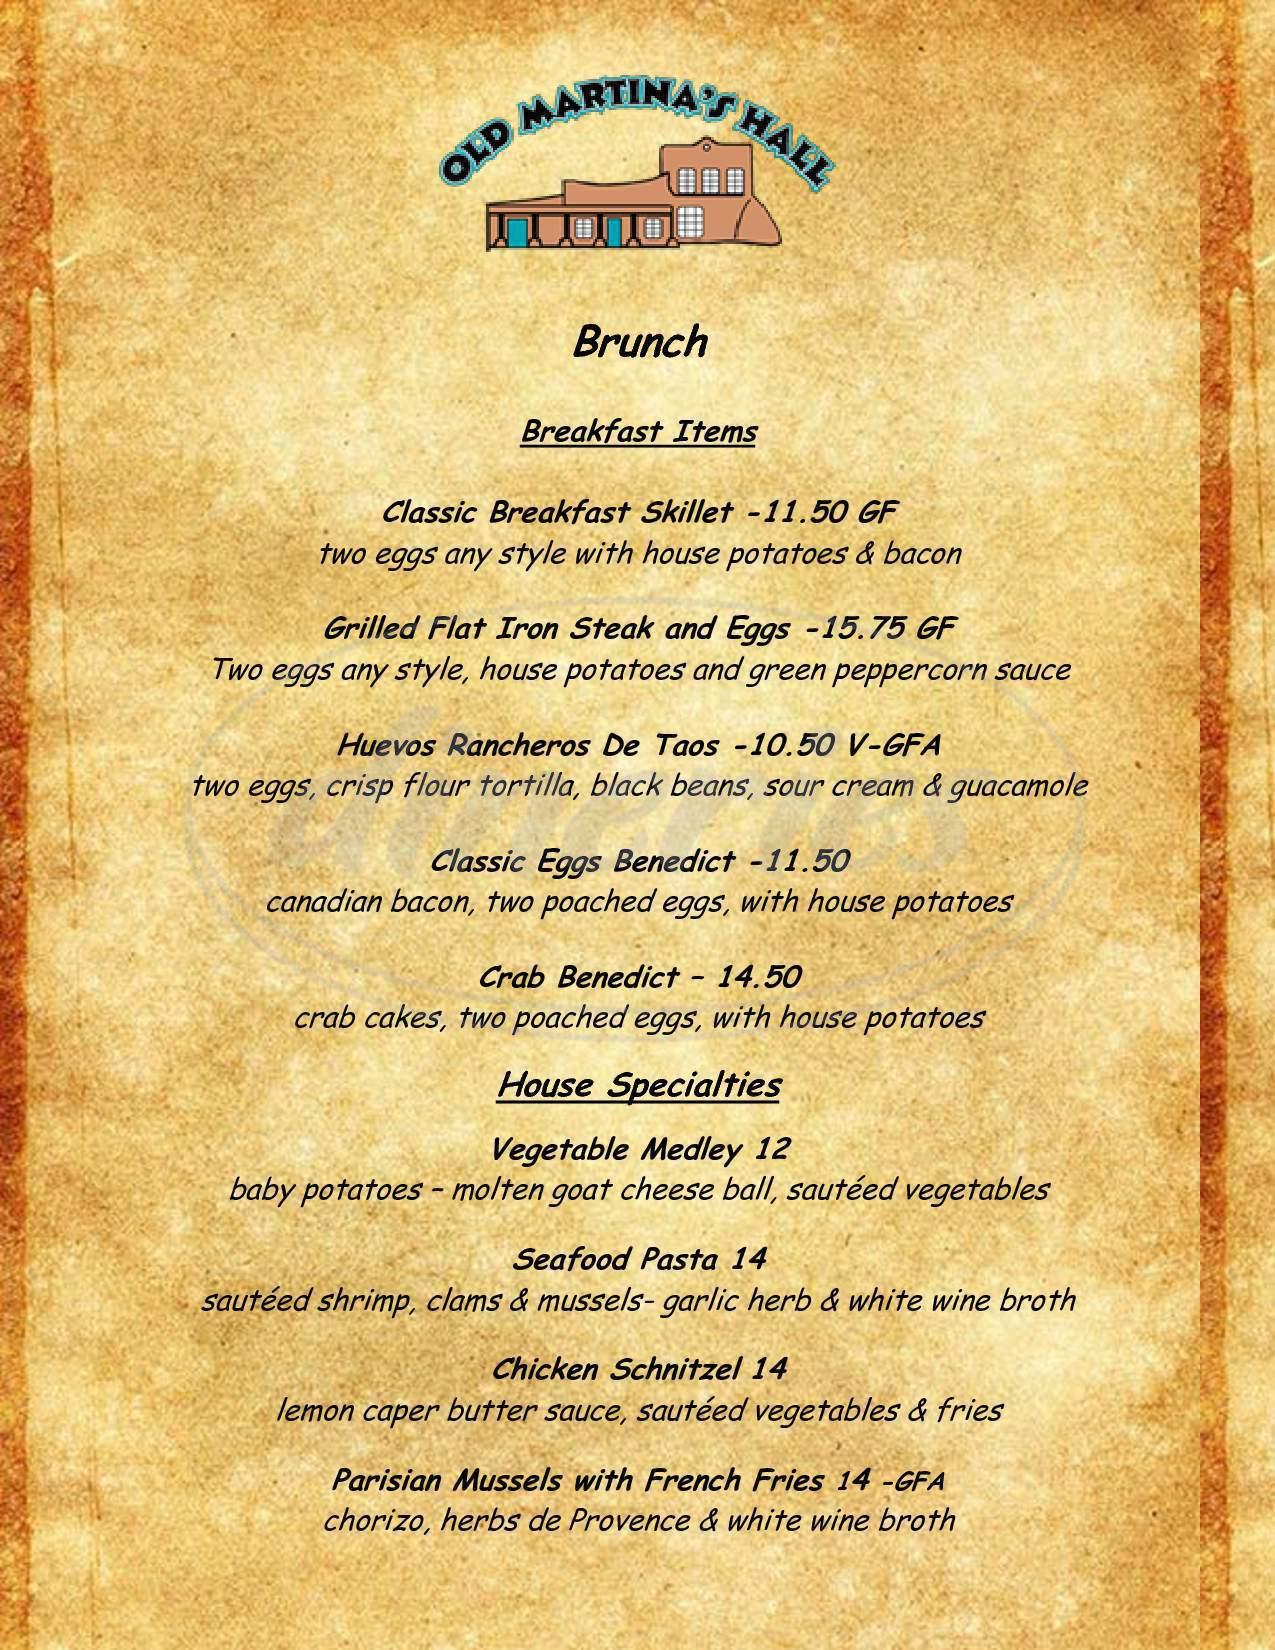 menu for Old Martina's Hall